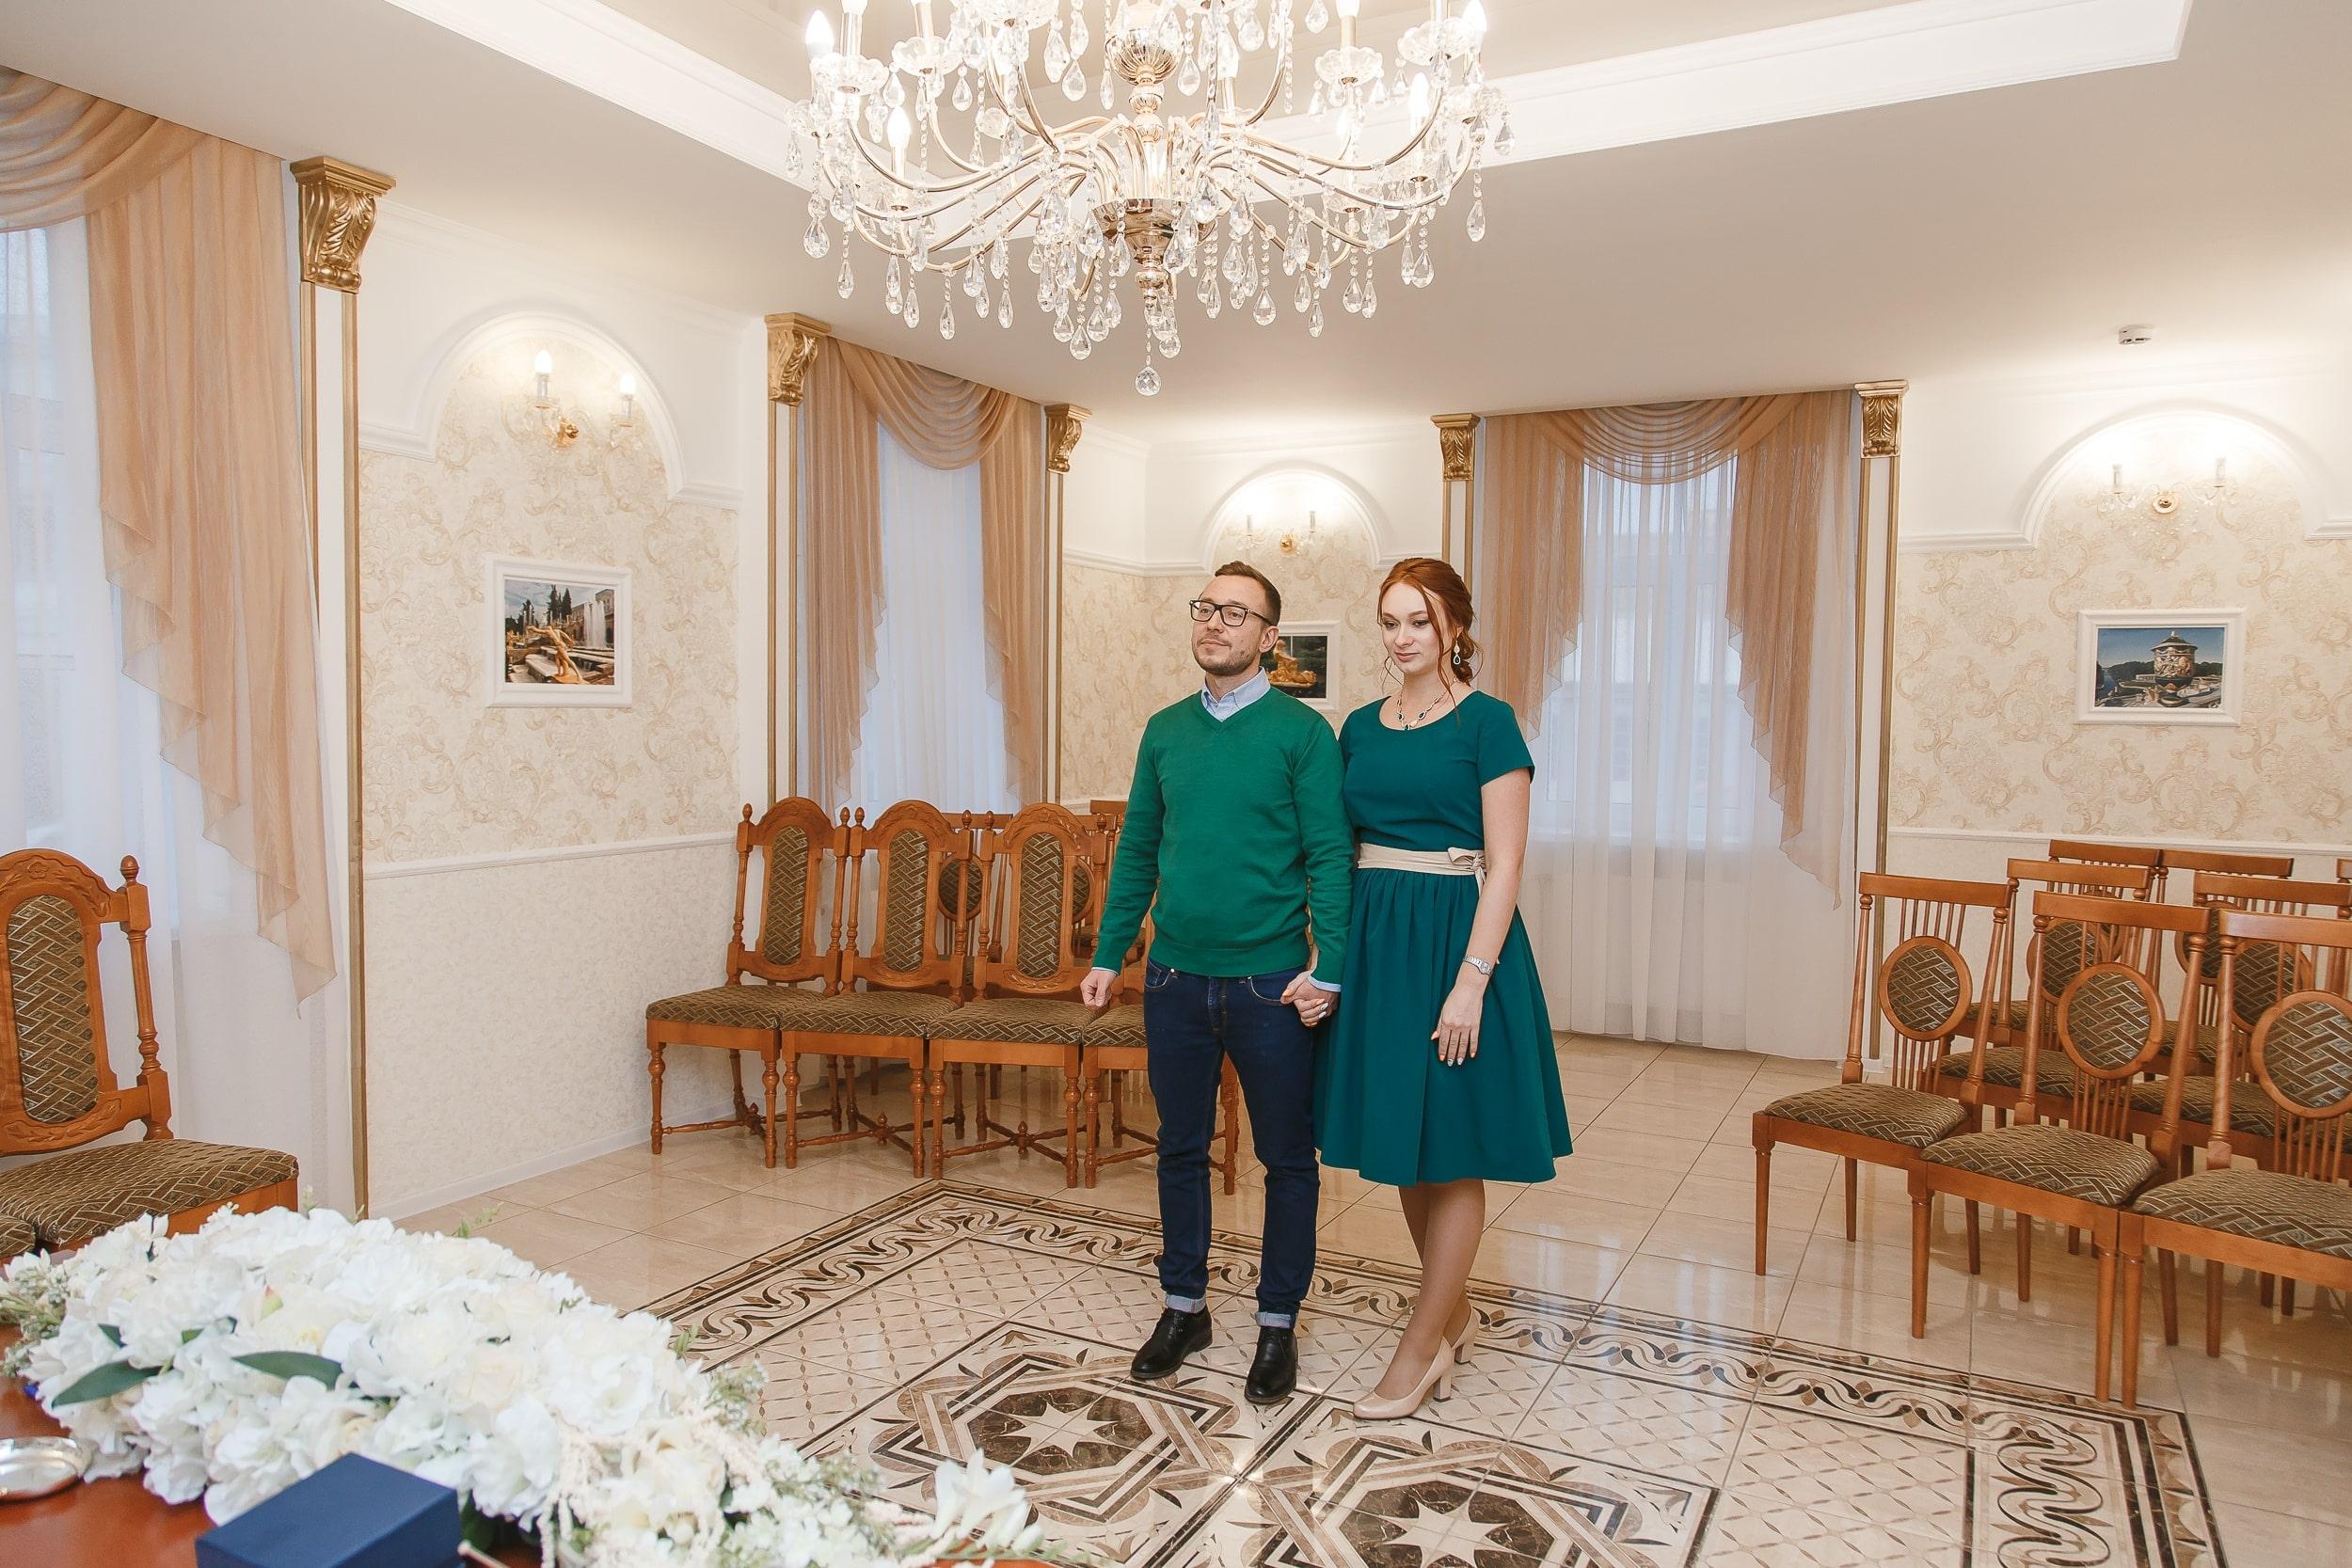 Дворец Бракосочетания №4 (г. Петергоф) интерьер